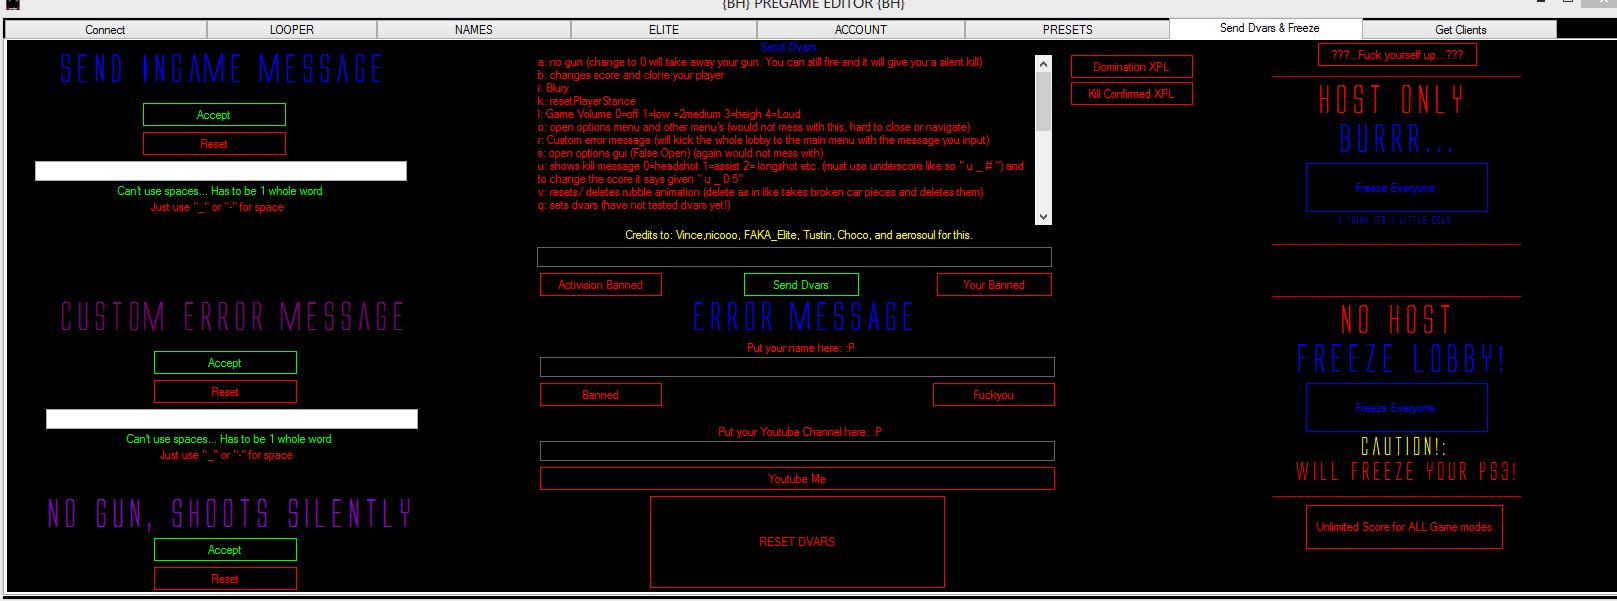 BaSs_HaXoR Pre-Game Editor CEX-DEX 01aeb3ef7e88a5b62014e573500adfd8